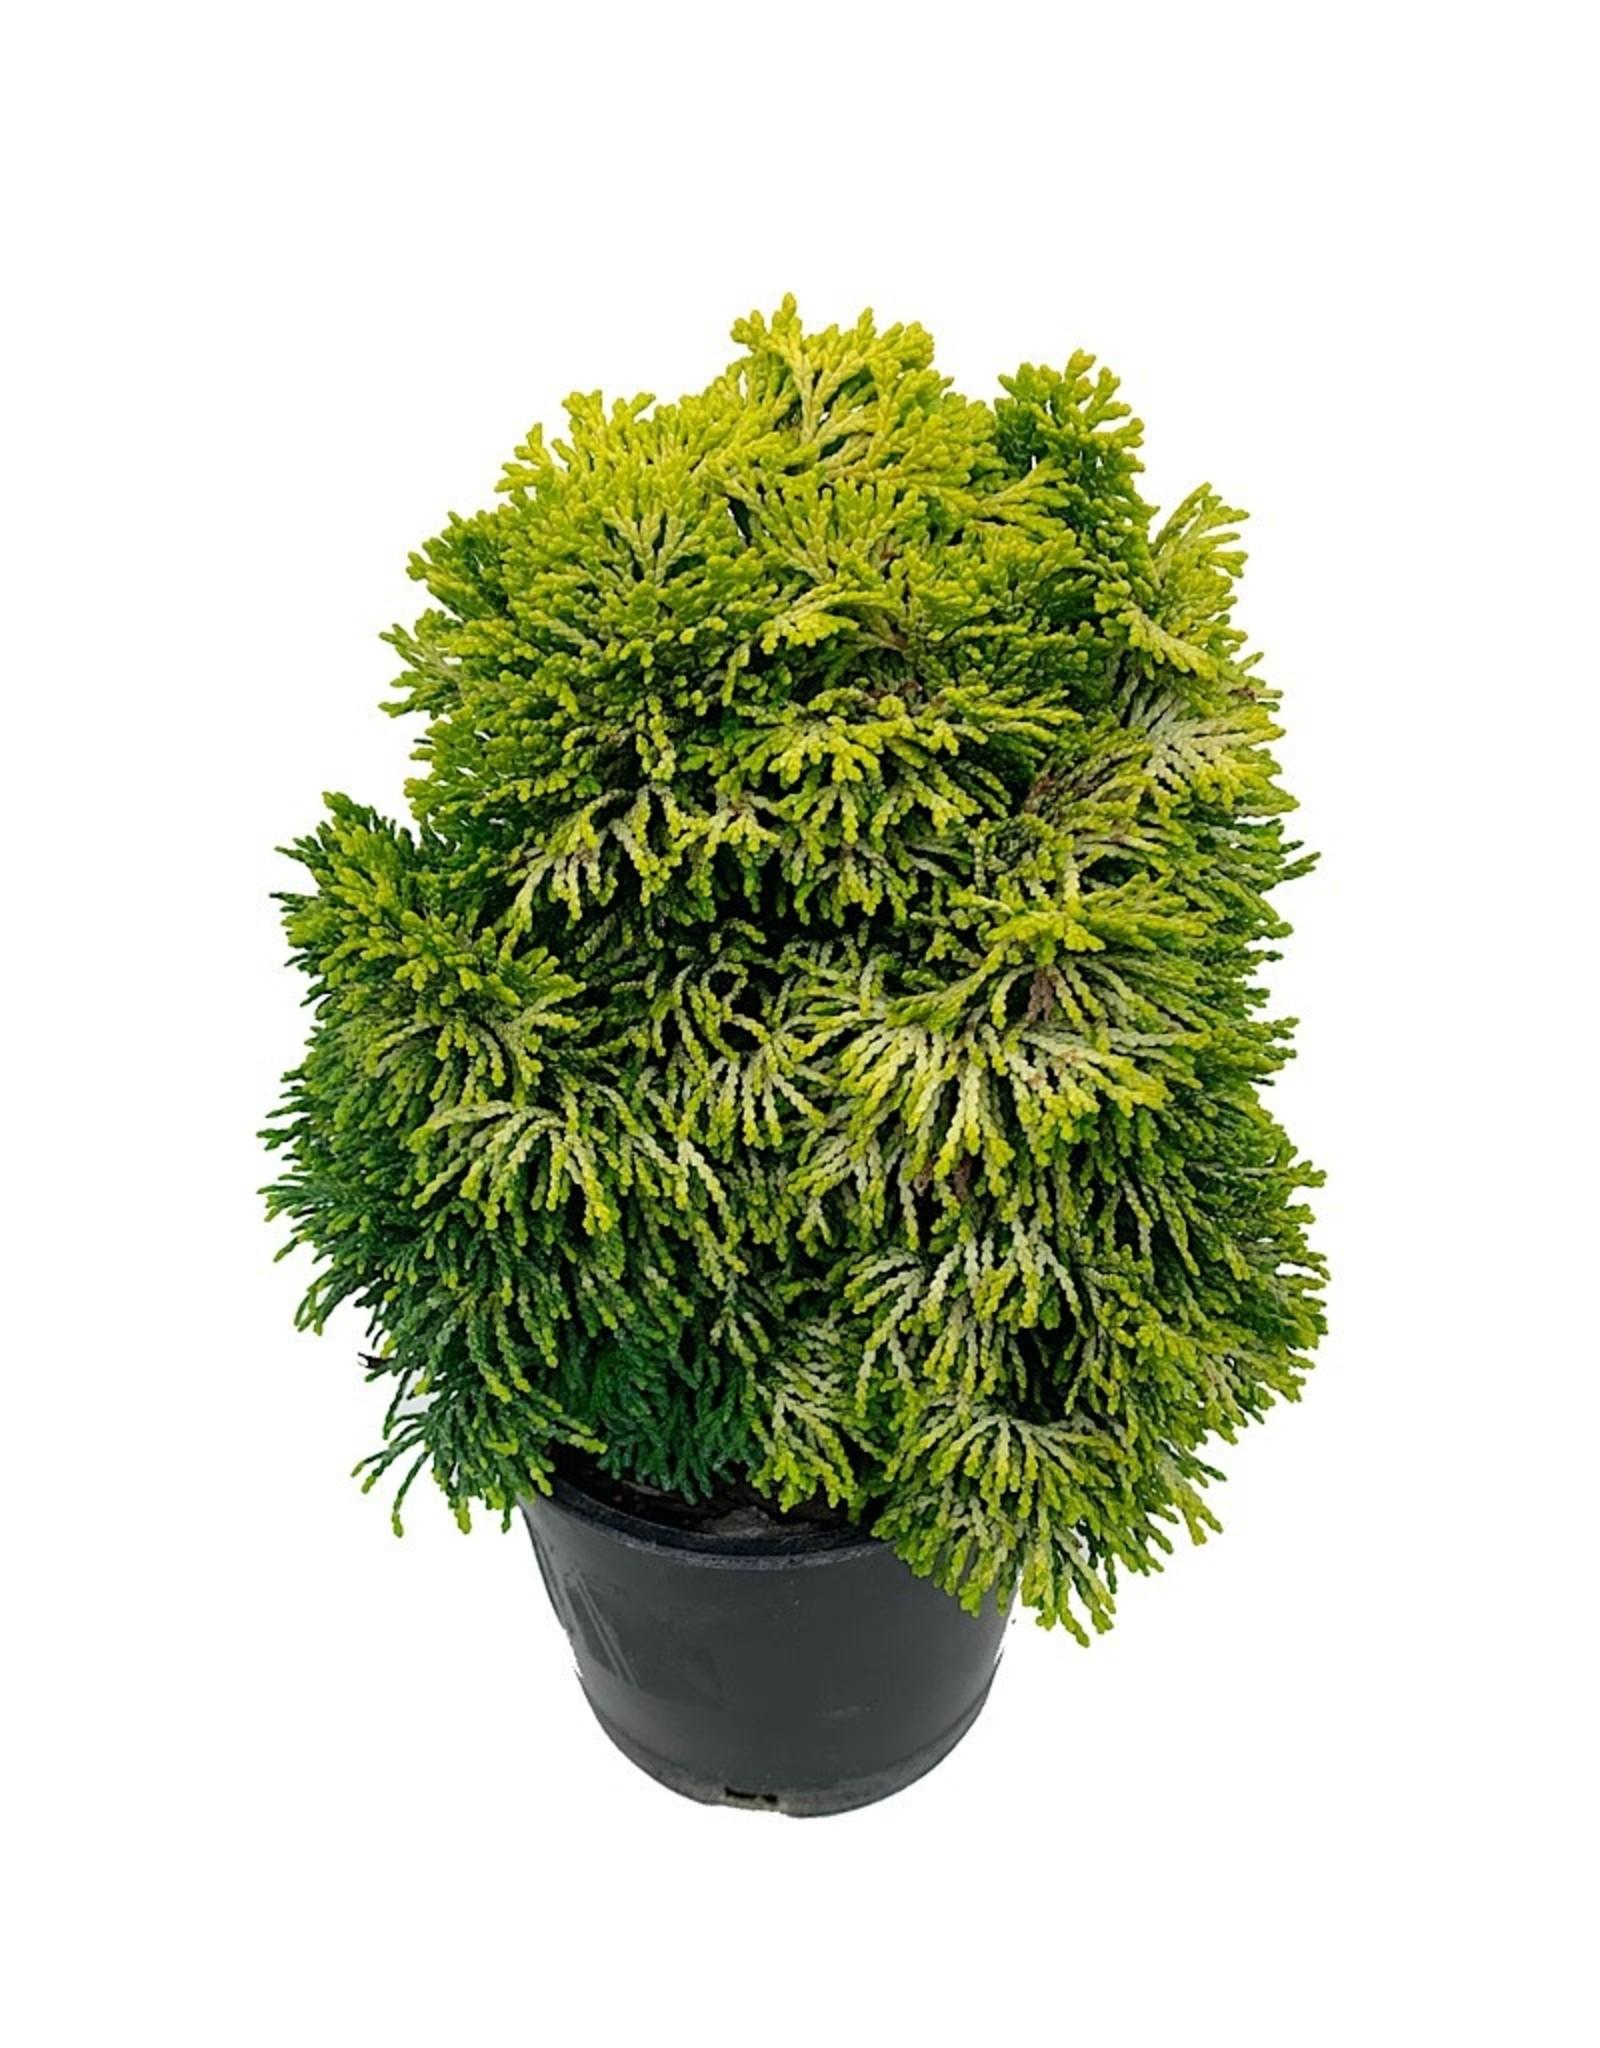 Chamaecyparis obtusa 'Nana Lutea' - 4 inch